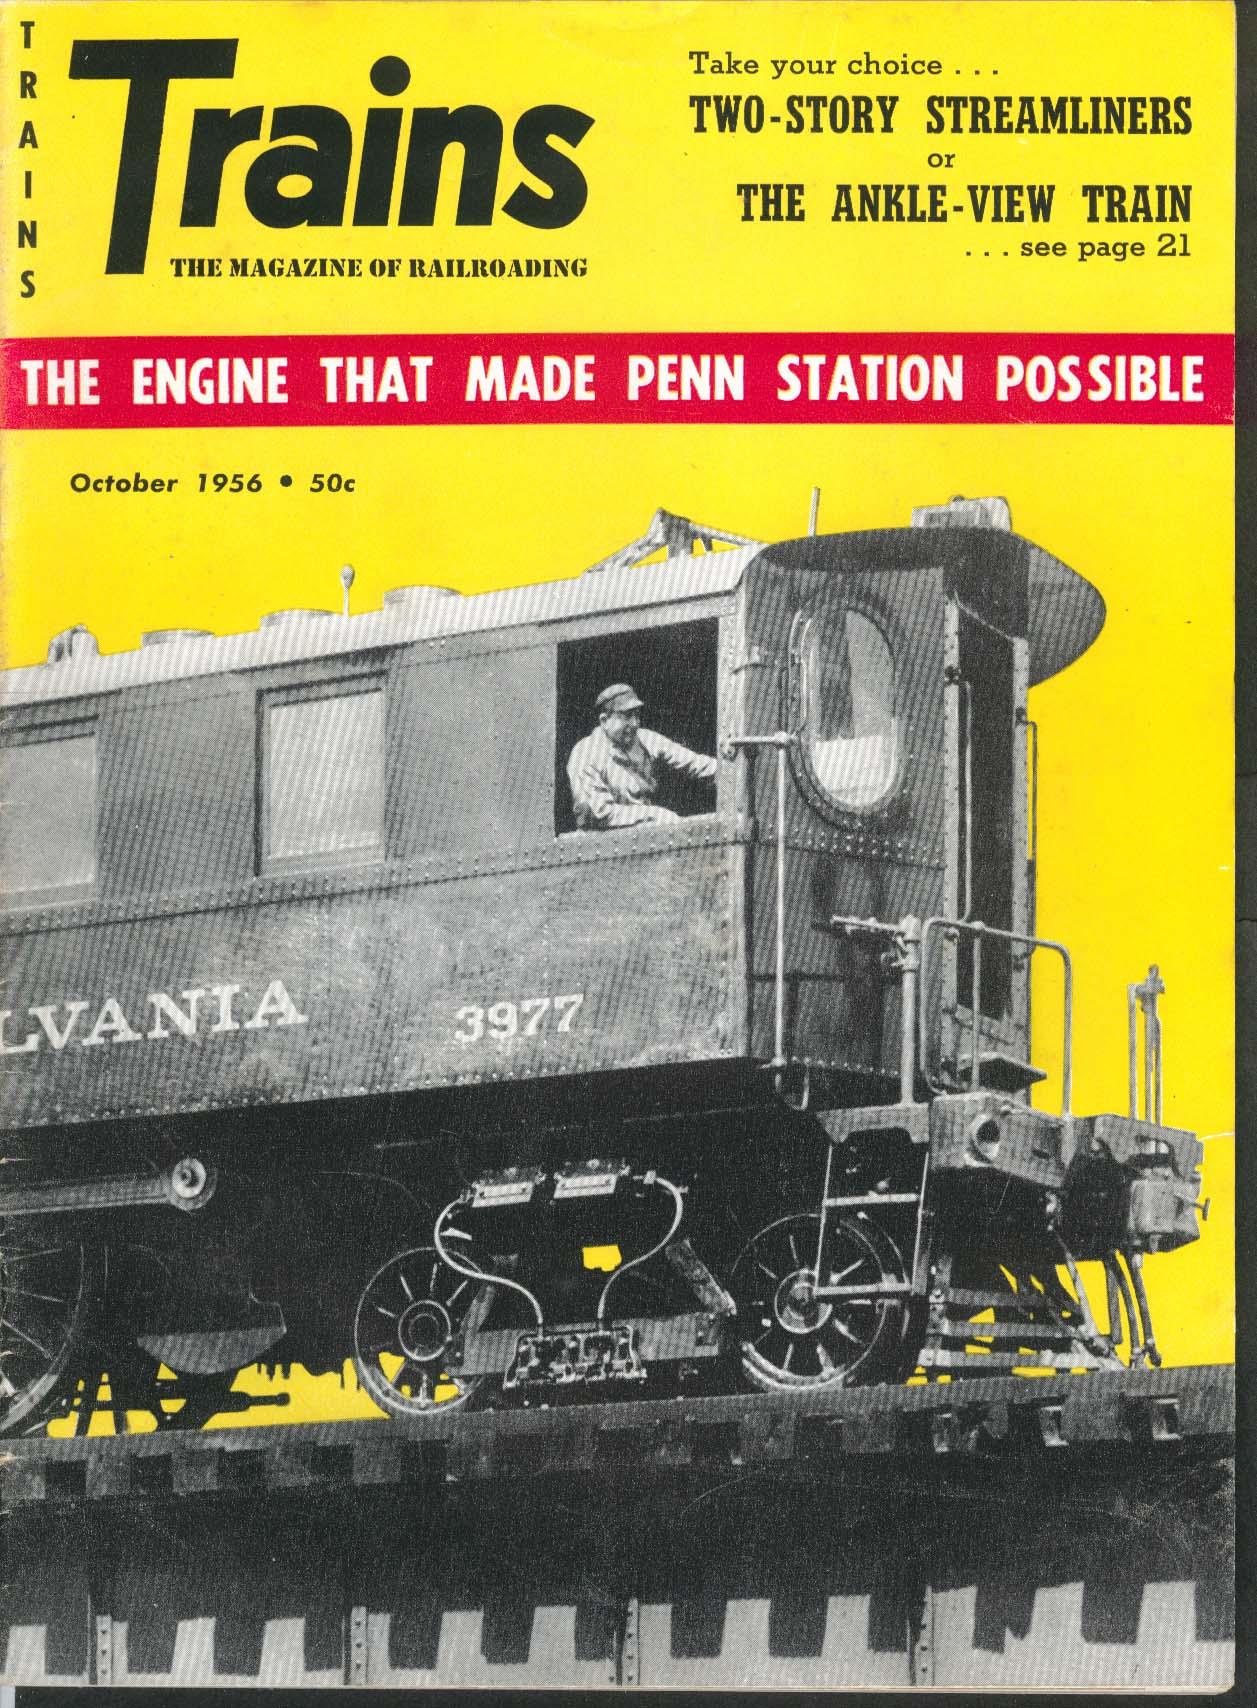 TRAINS Brazil railroads Penn Station DD1 Manhattan Transfer Robert Hale 10 1956